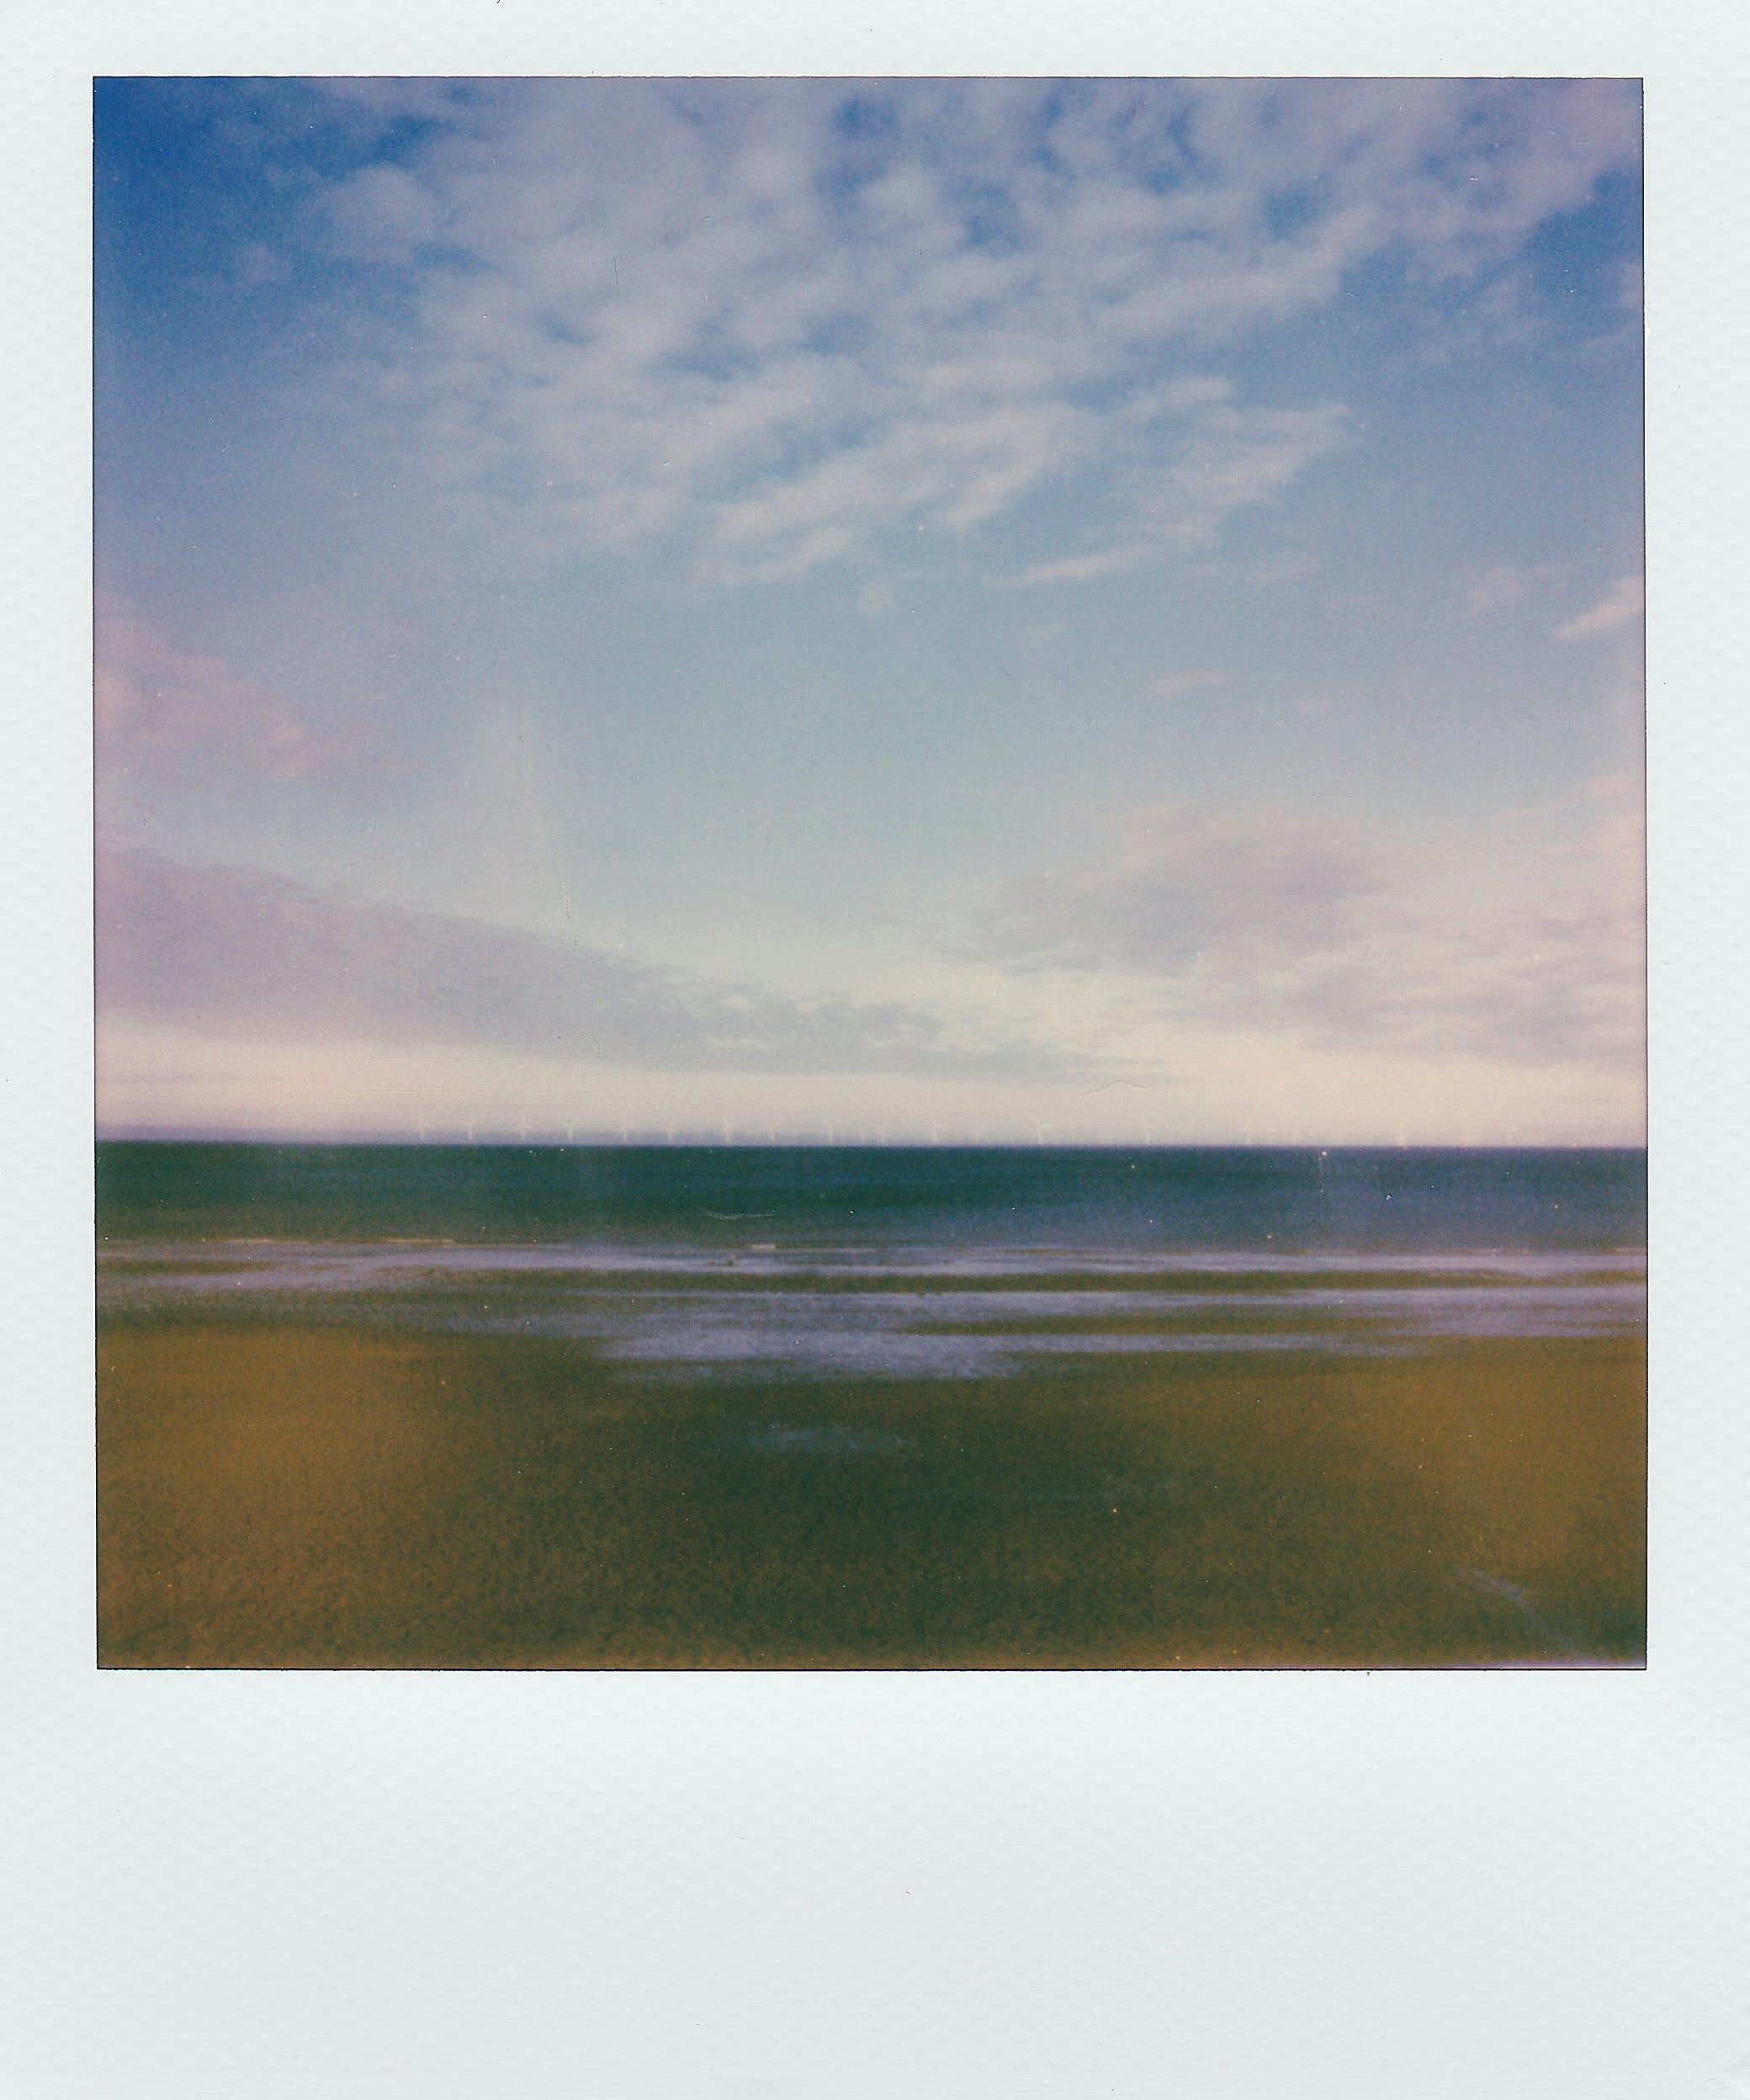 Free stock photo of beach, clouds, daylight, sand